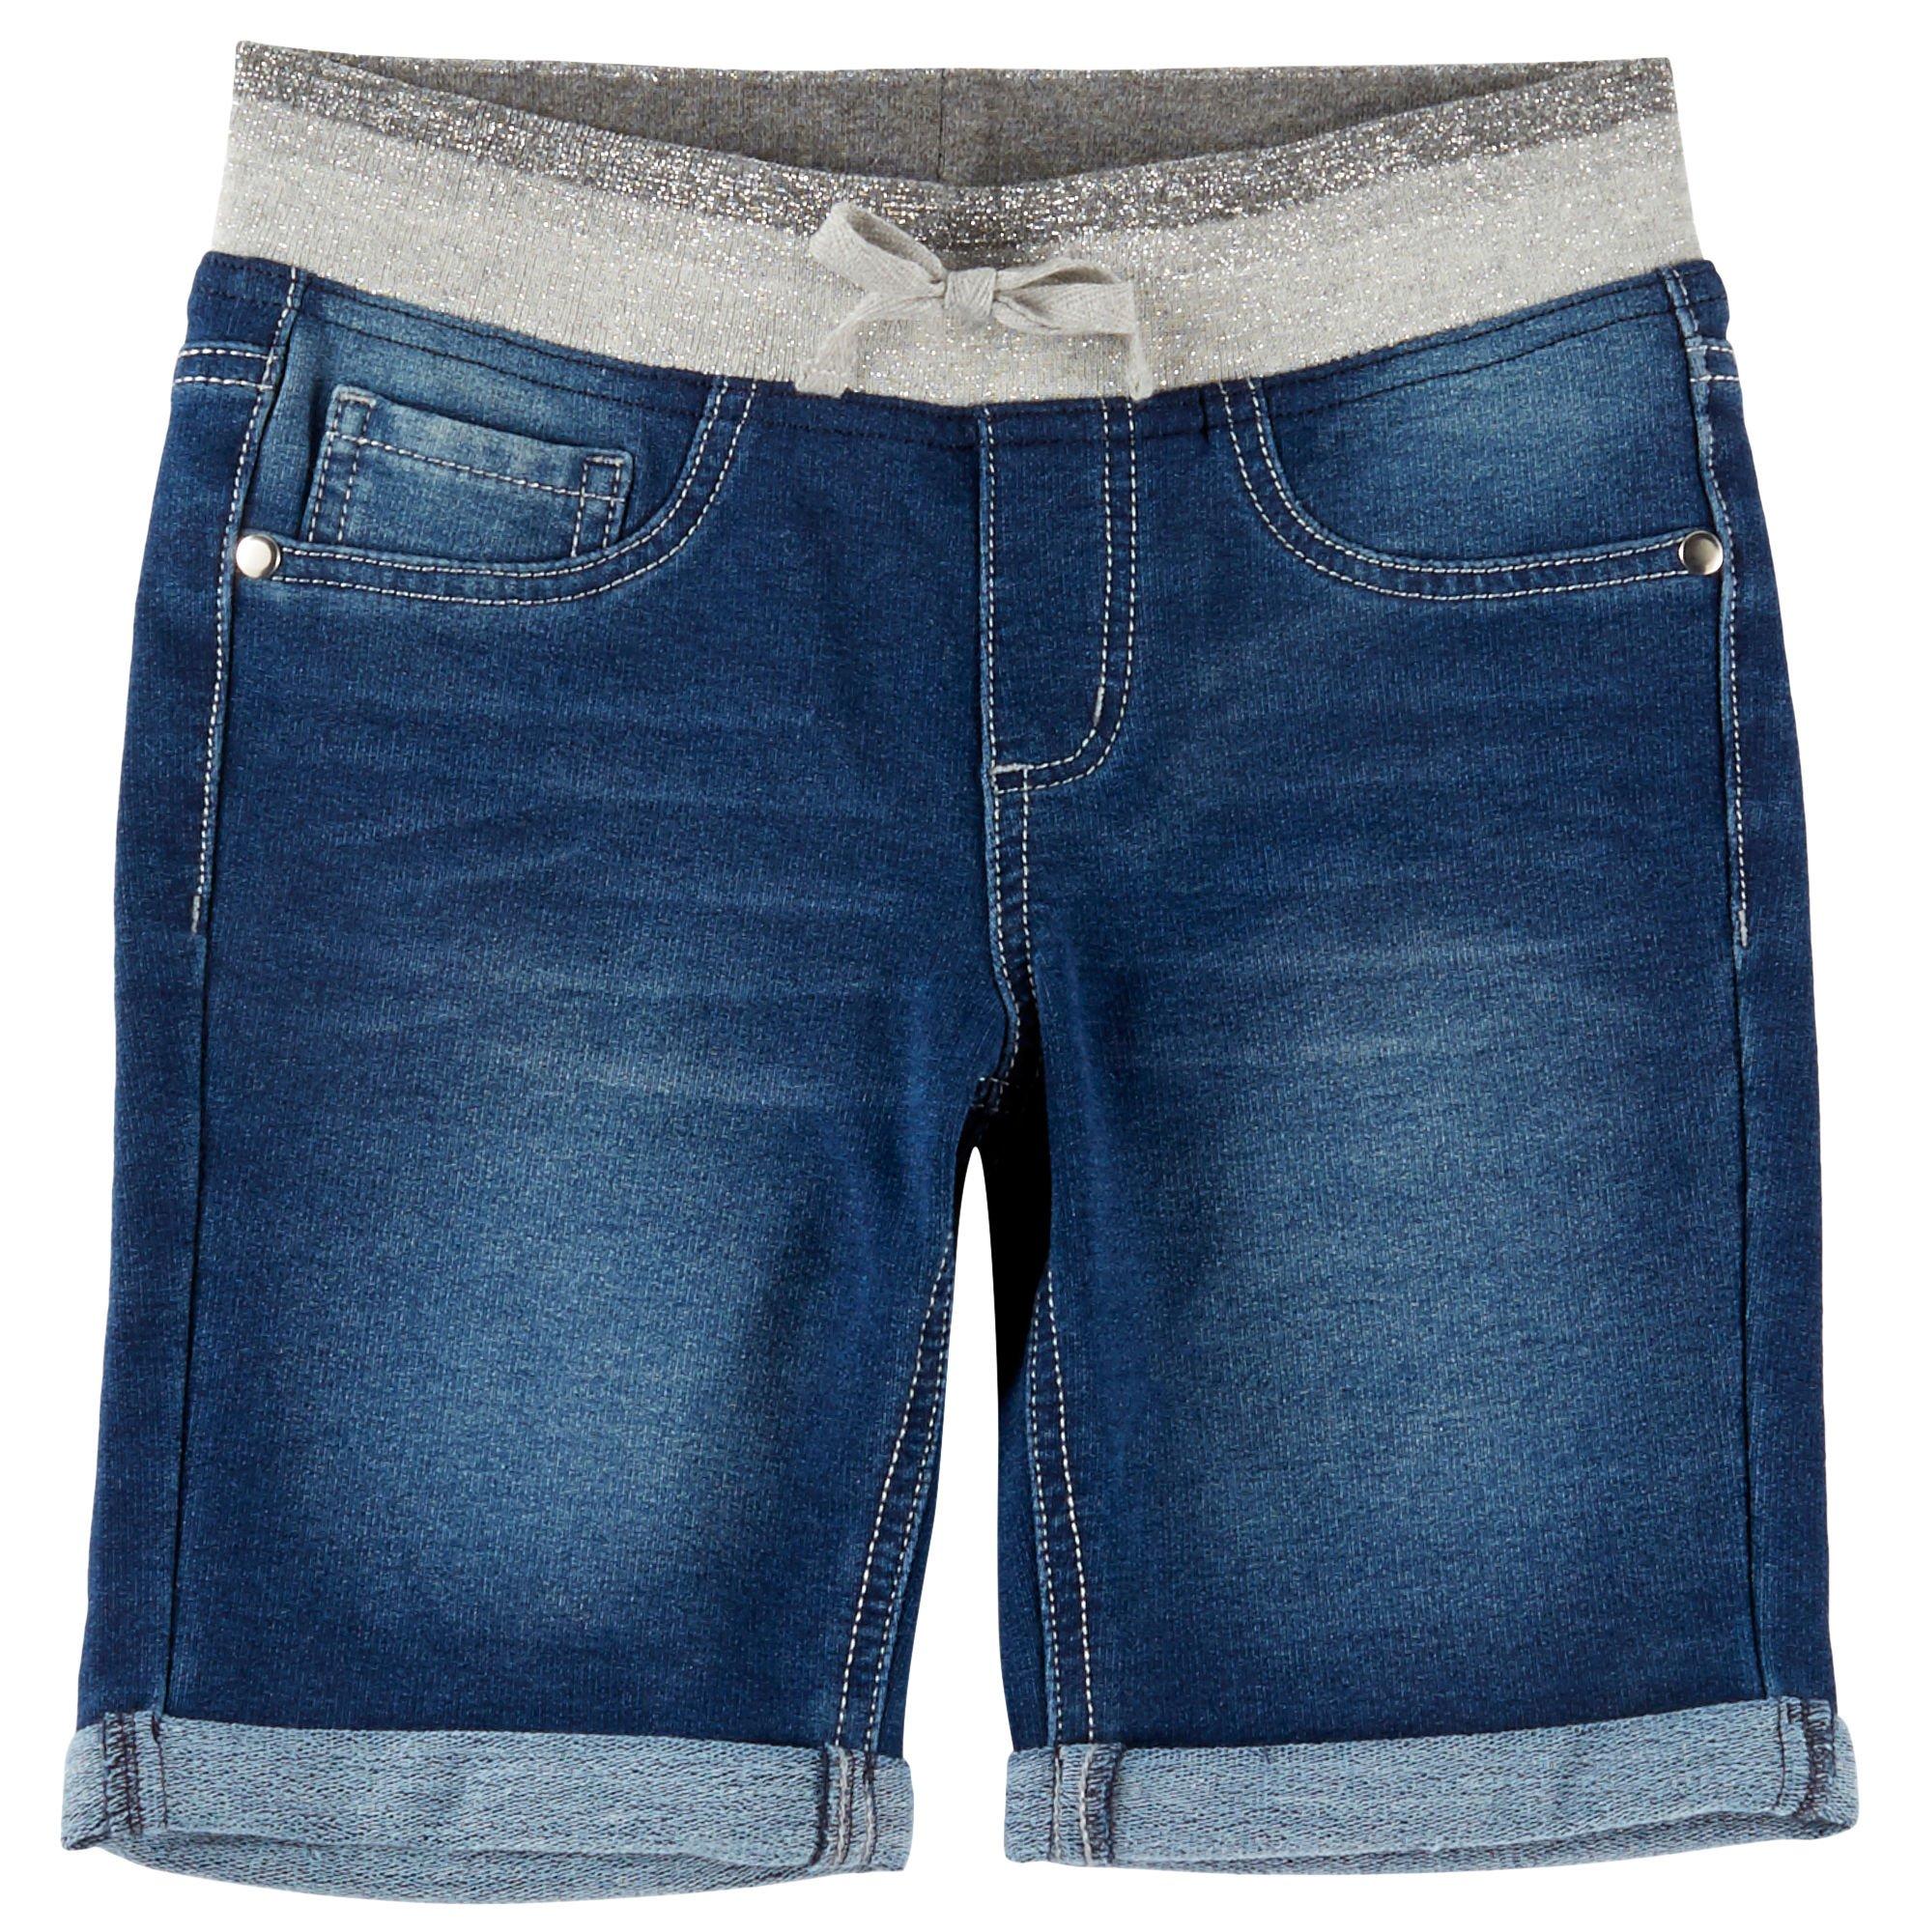 d33db3696c Get Quotations · Vanilla Star Big Girls Knit Waist Denim Bermuda Shorts